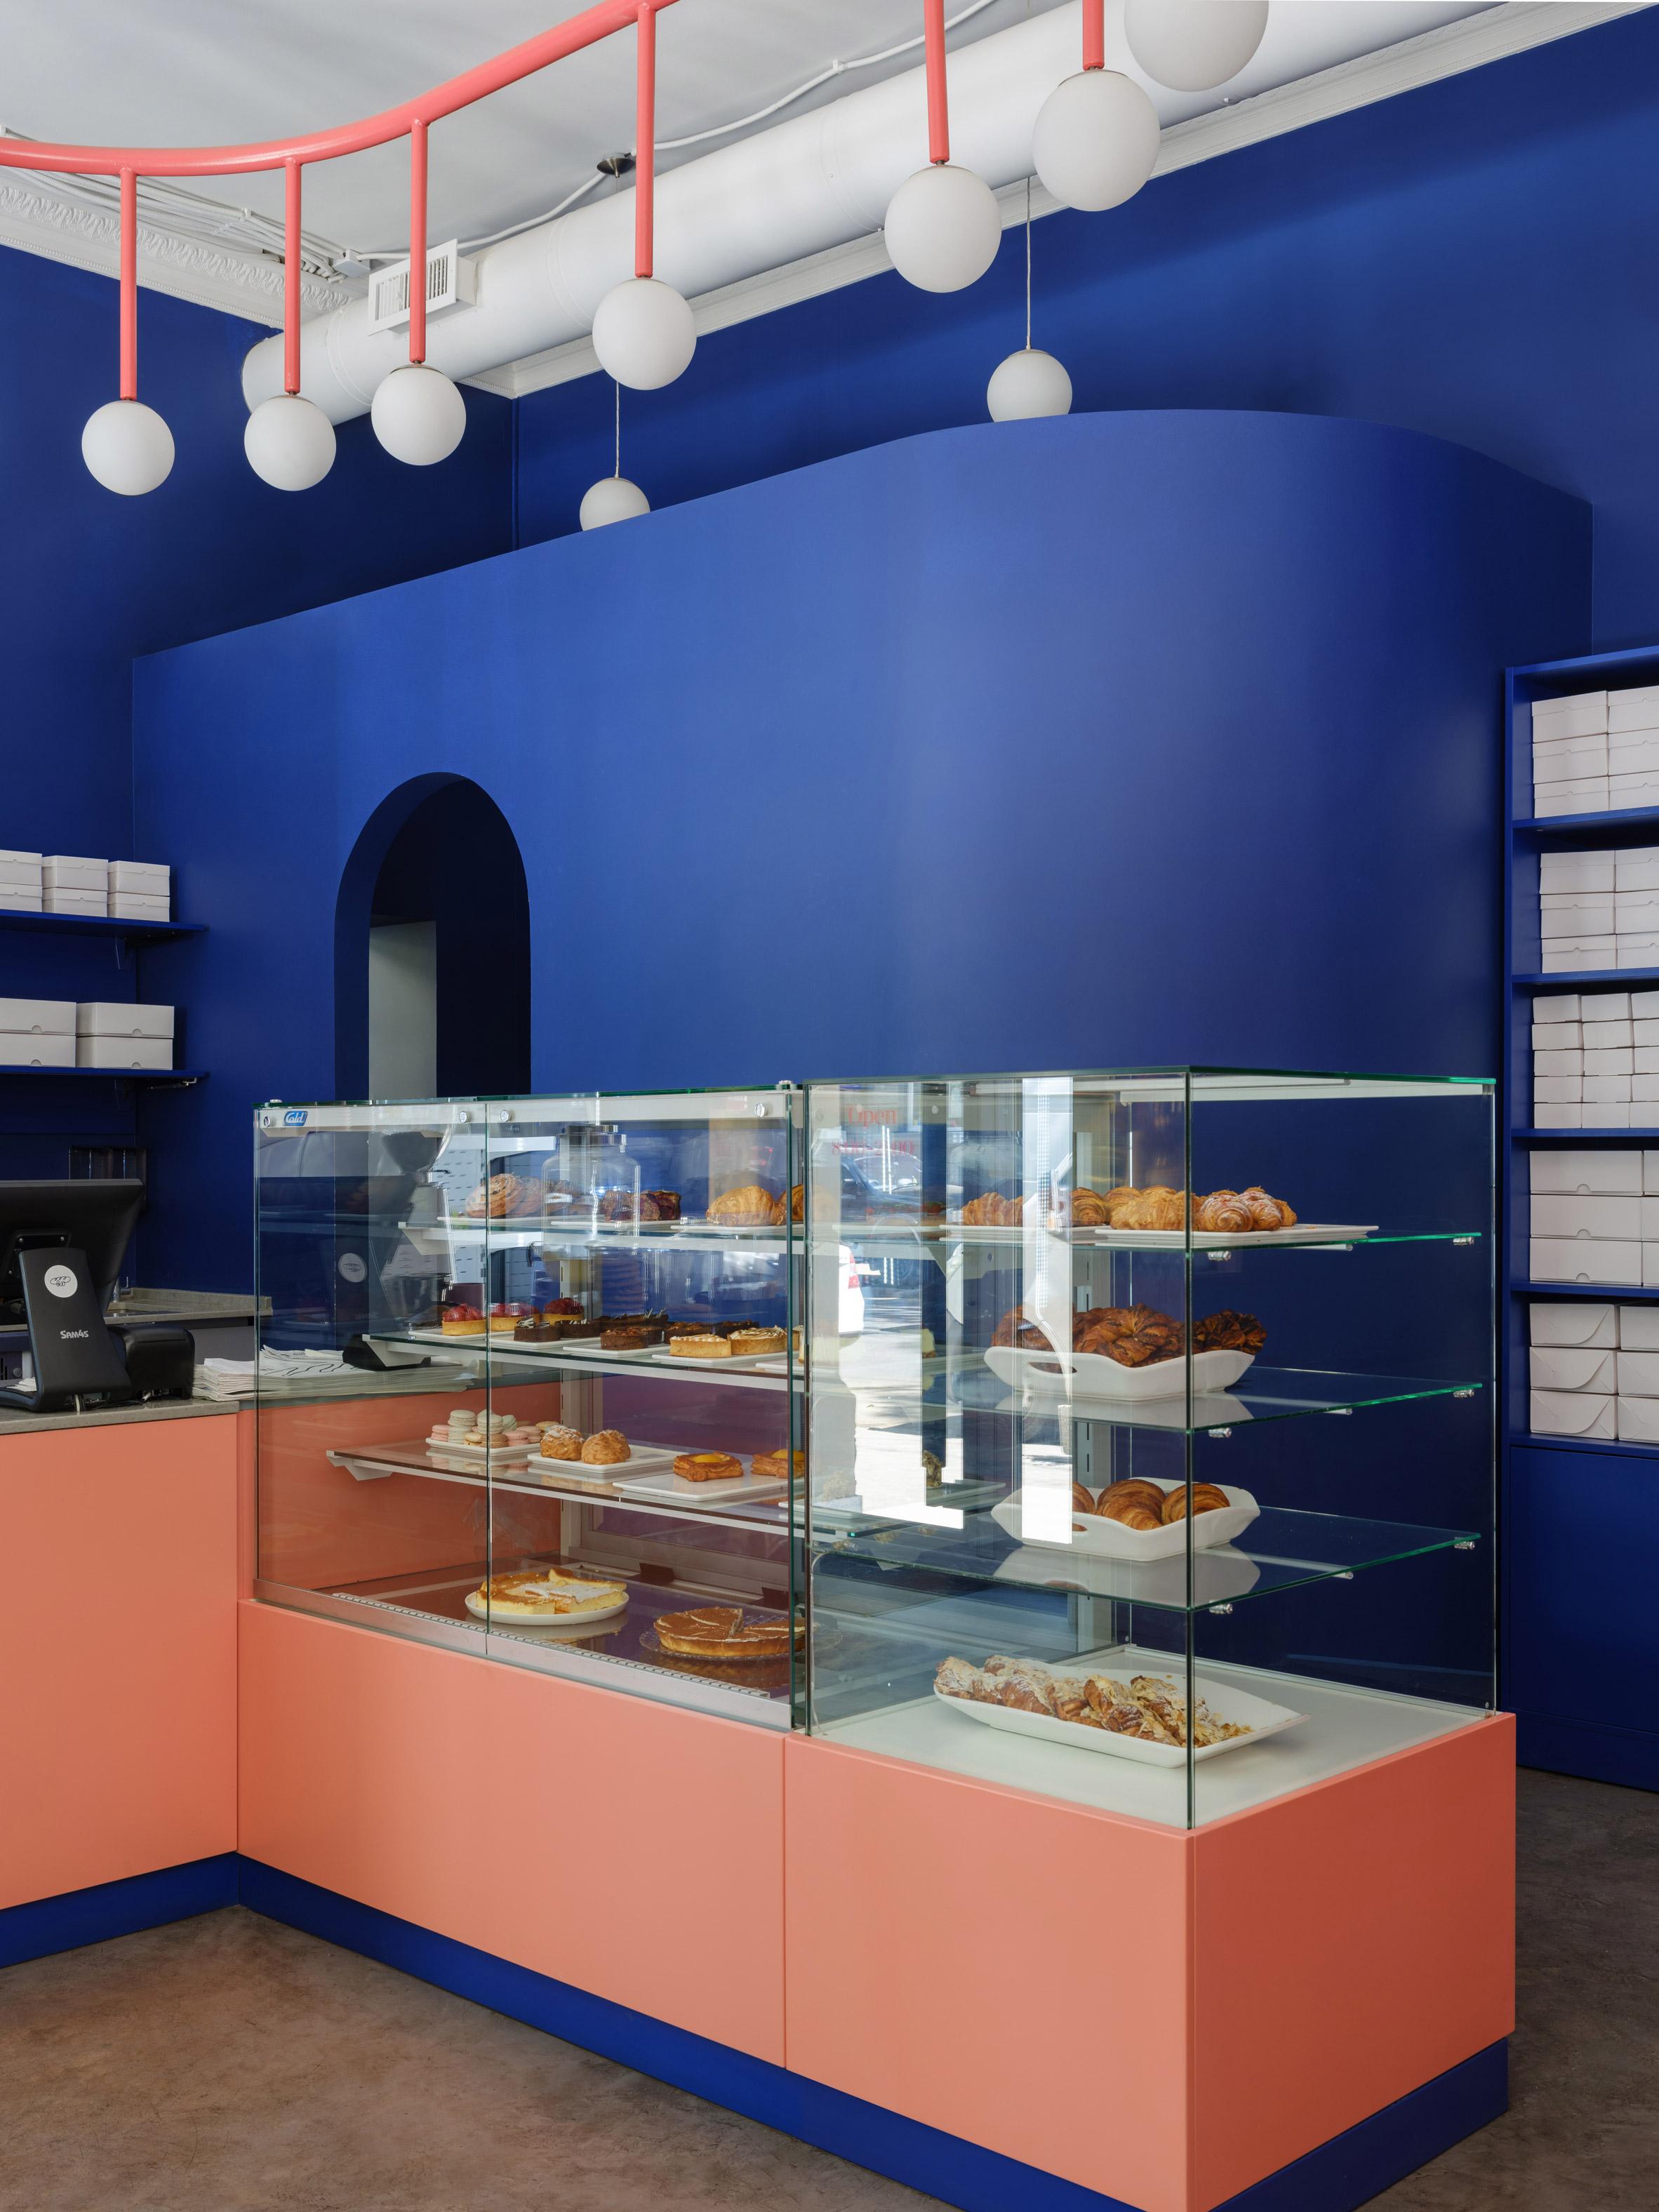 Breadway Bakery by Artem Trigubchak